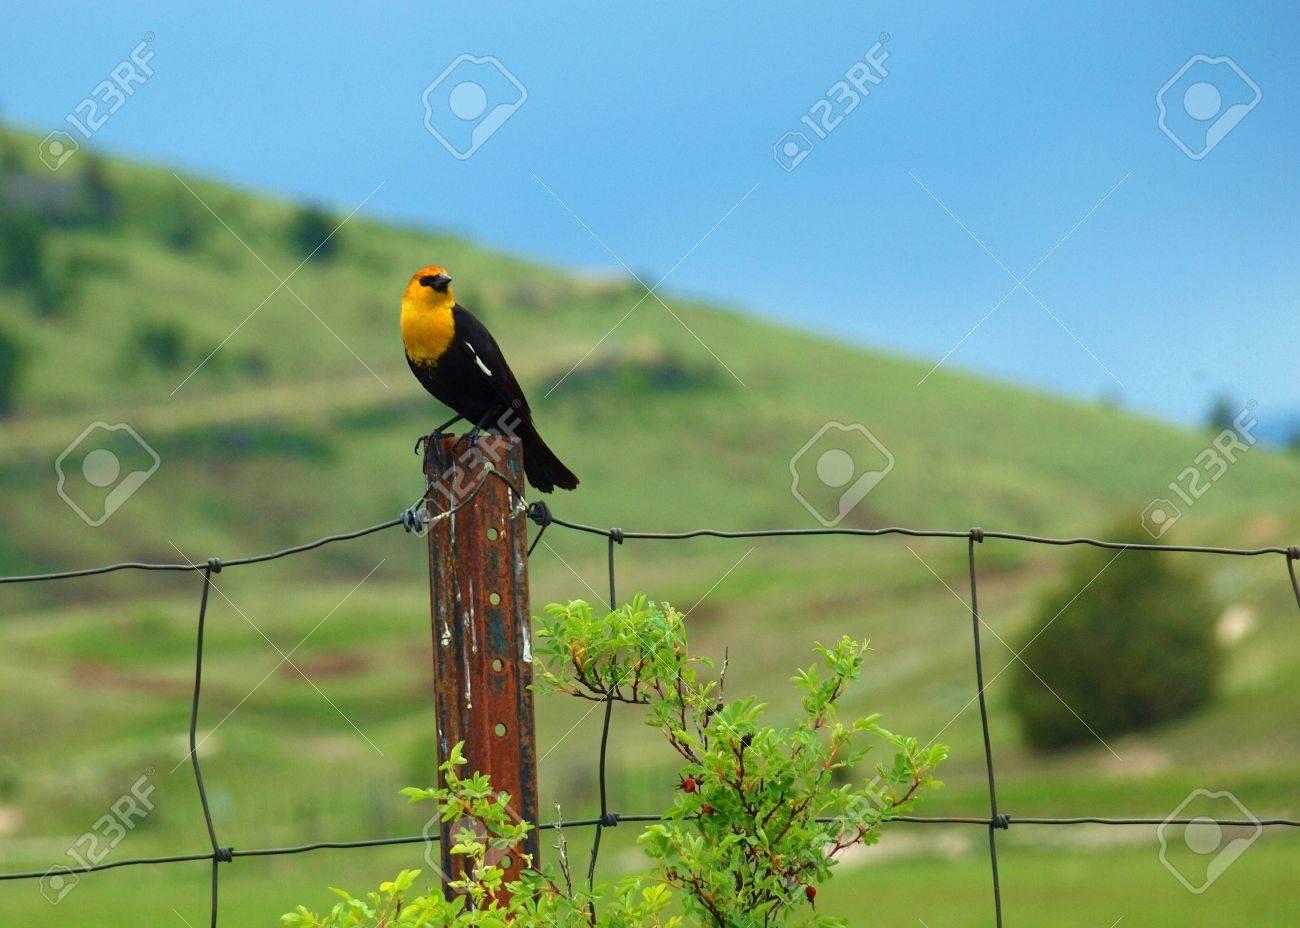 Yellow Headed Blackbird Range Yellow Headed Blackbird in the